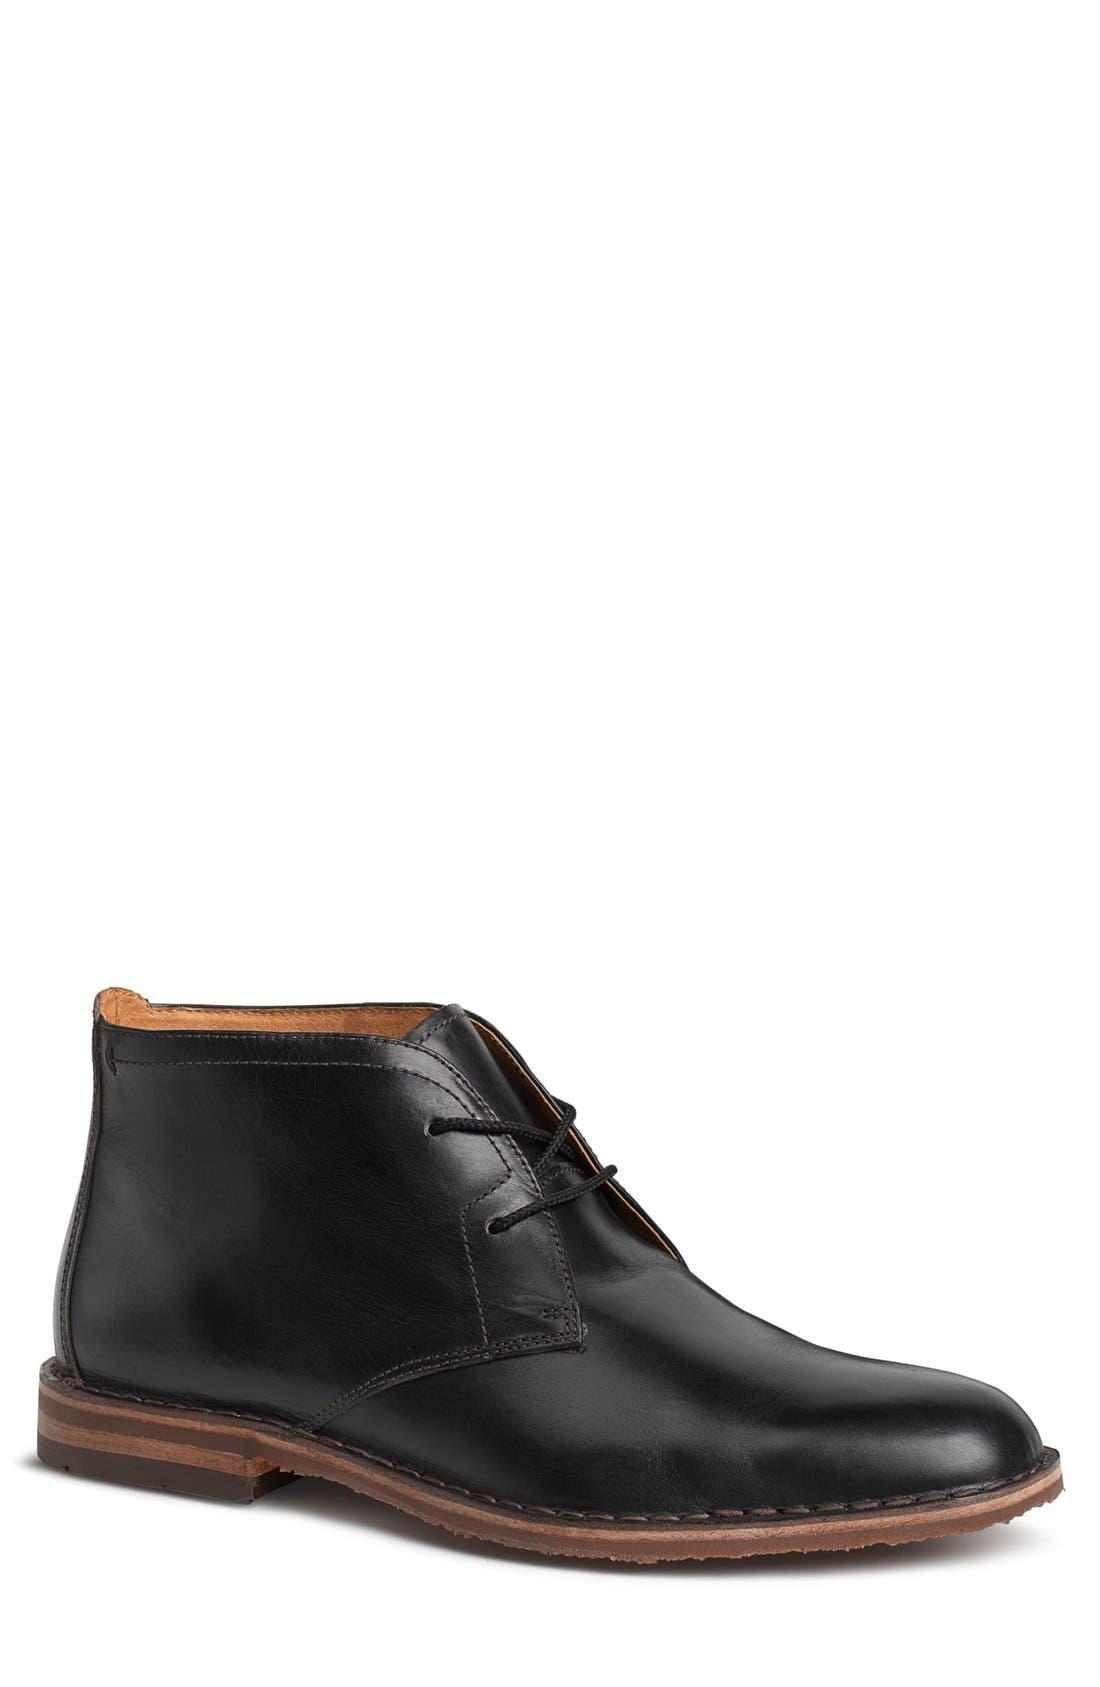 'Brady' Chukka Boot,                         Main,                         color, BLACK LEATHER